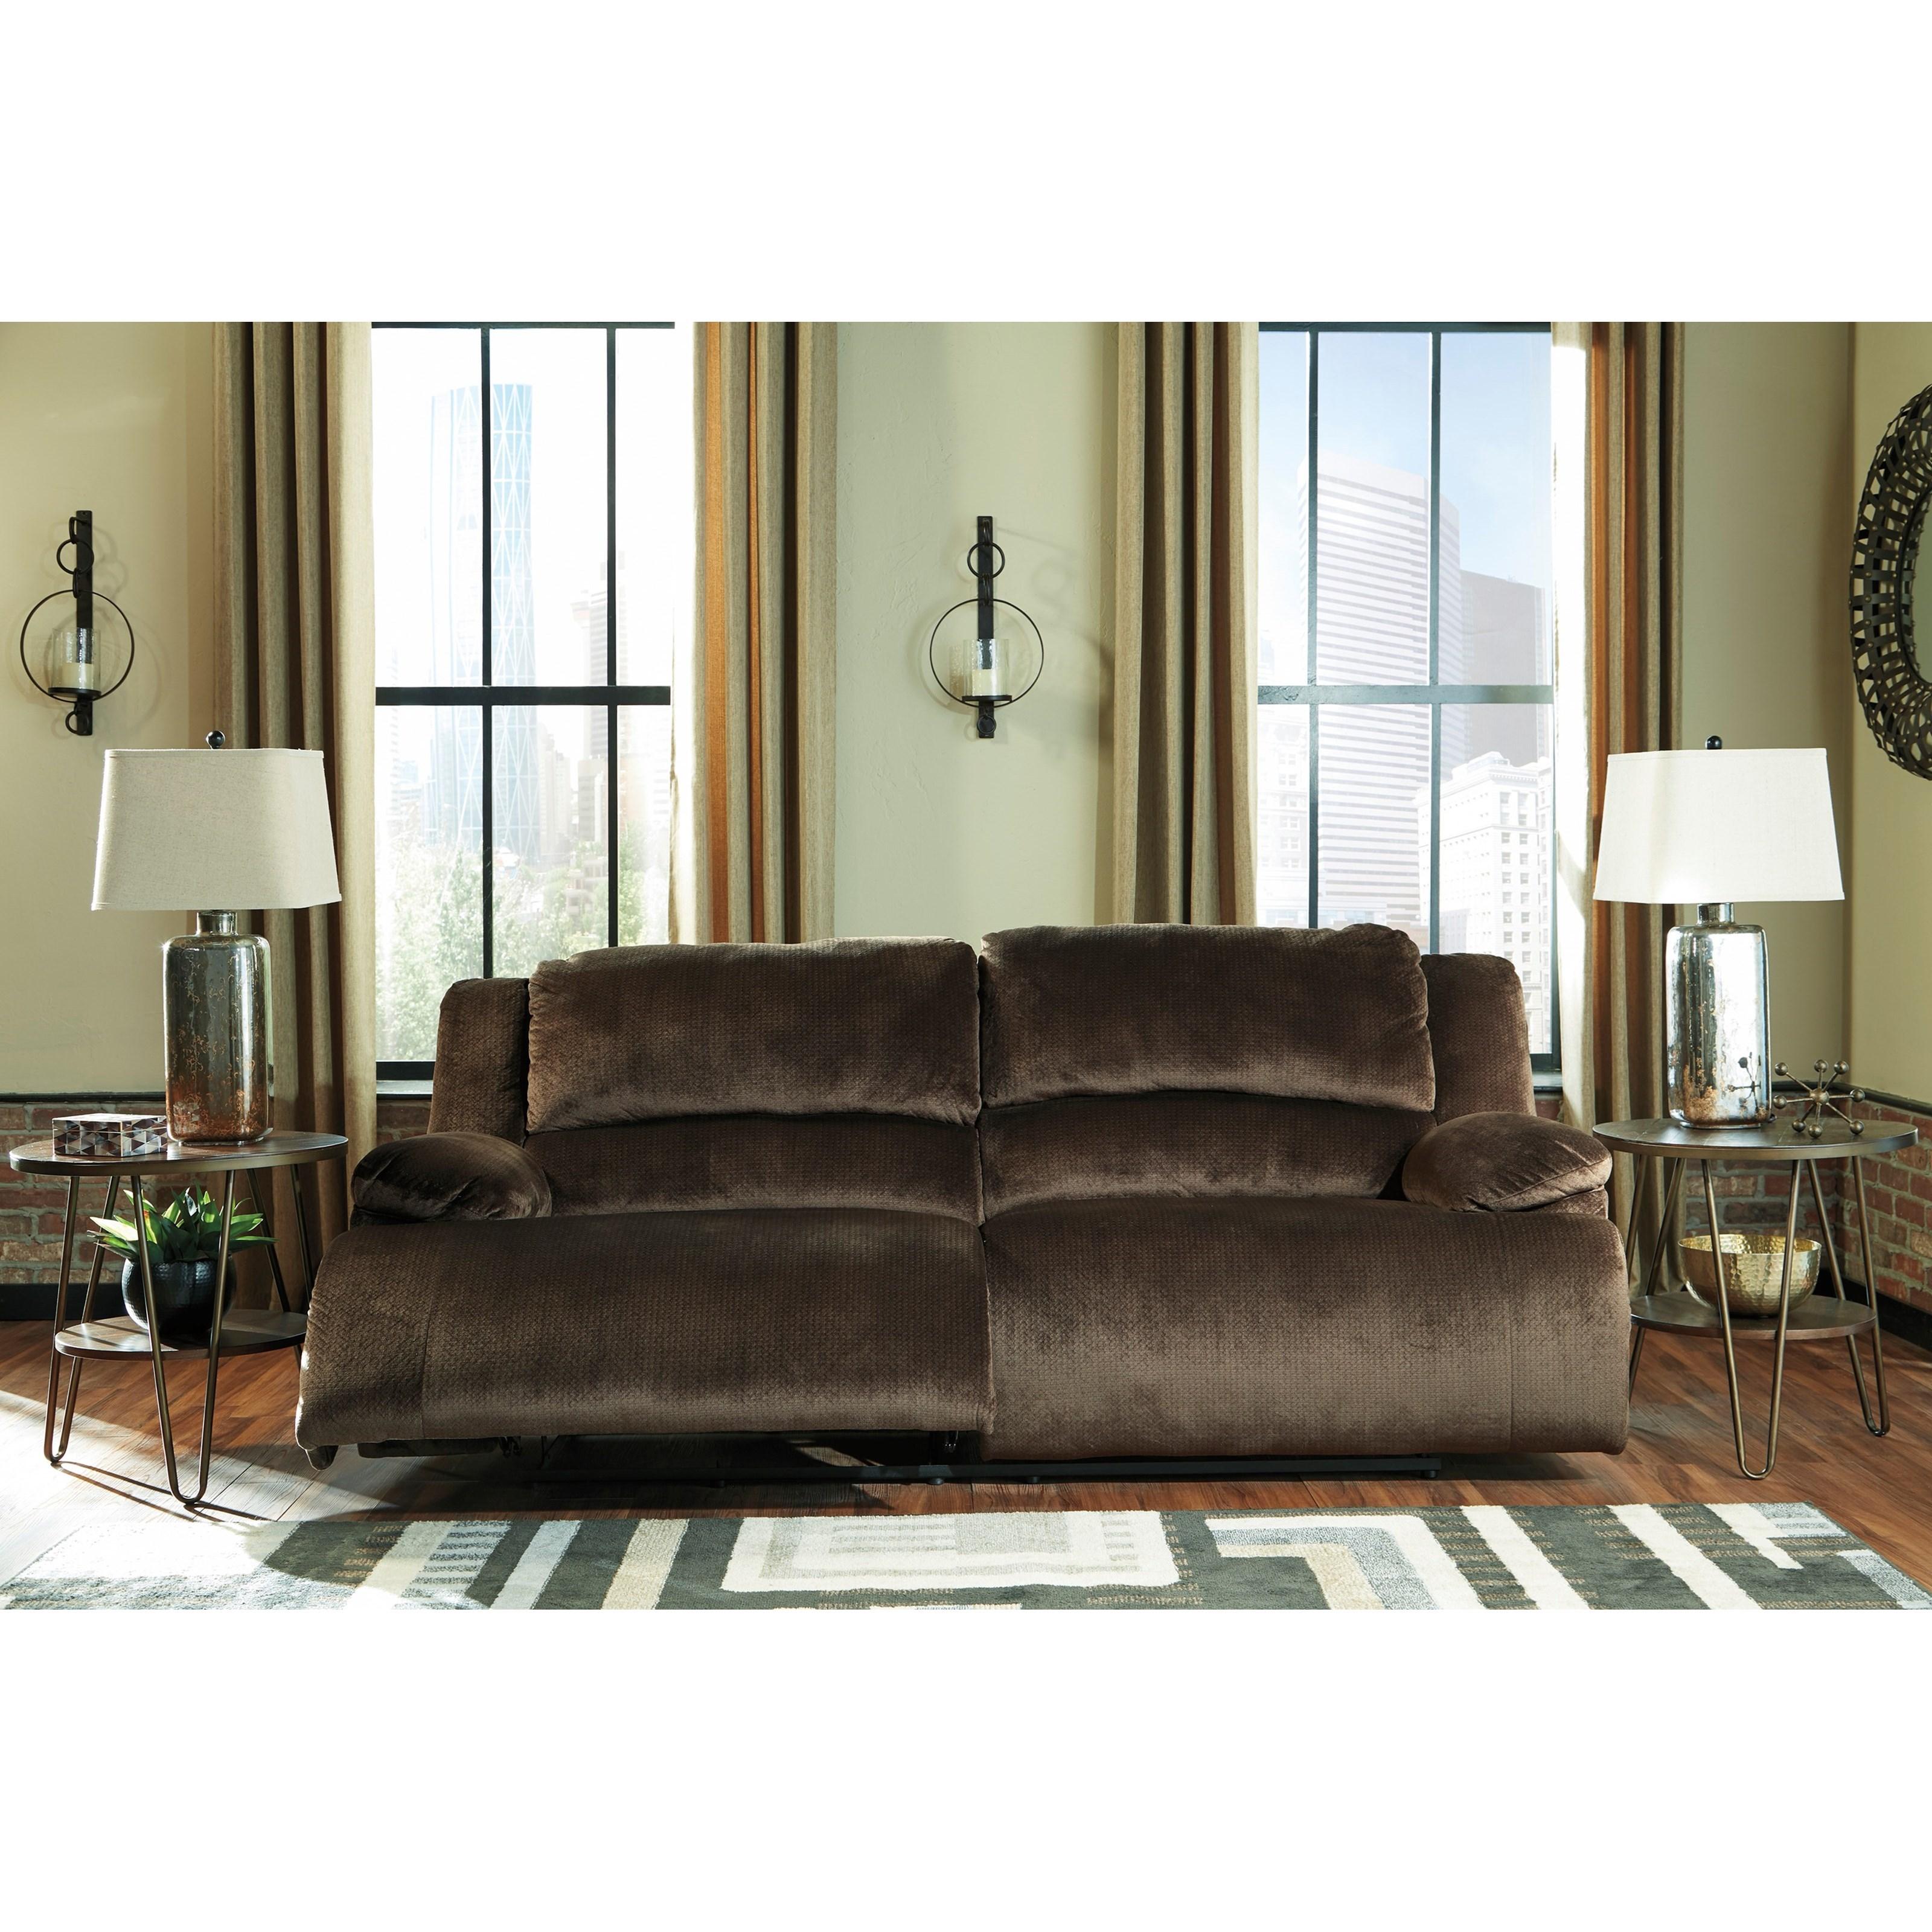 Ashley Furniture Manufacturer: Signature Design By Ashley Clonmel Contemporary 2 Seat